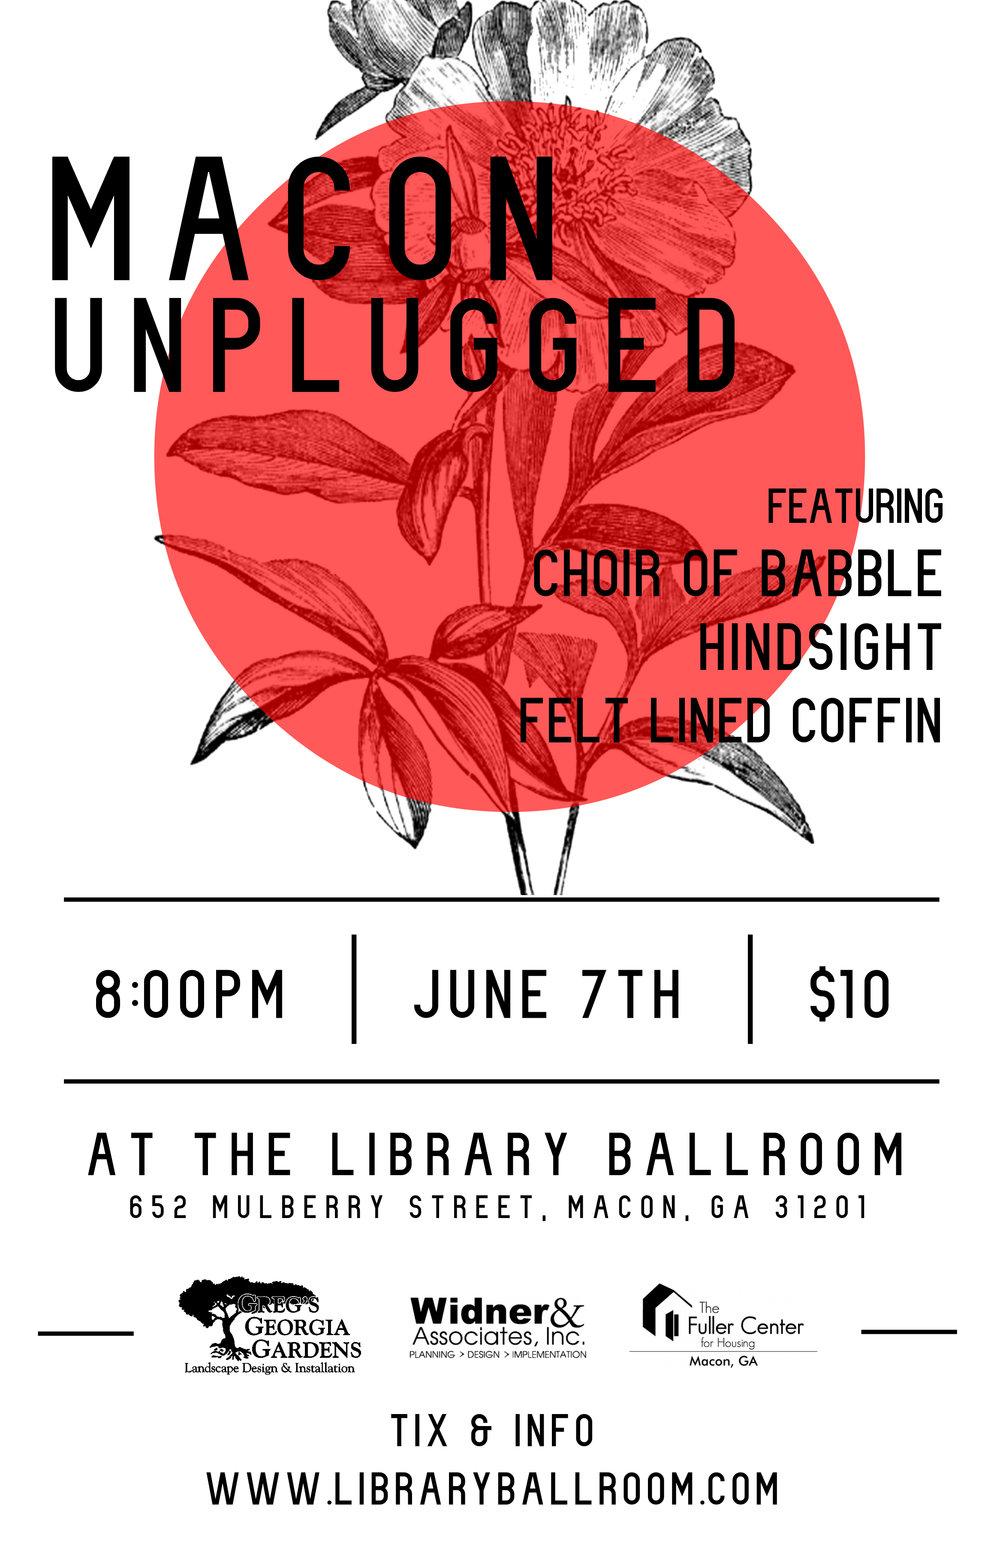 Macon Unplugged - Library Ballroom - June 7th.jpg